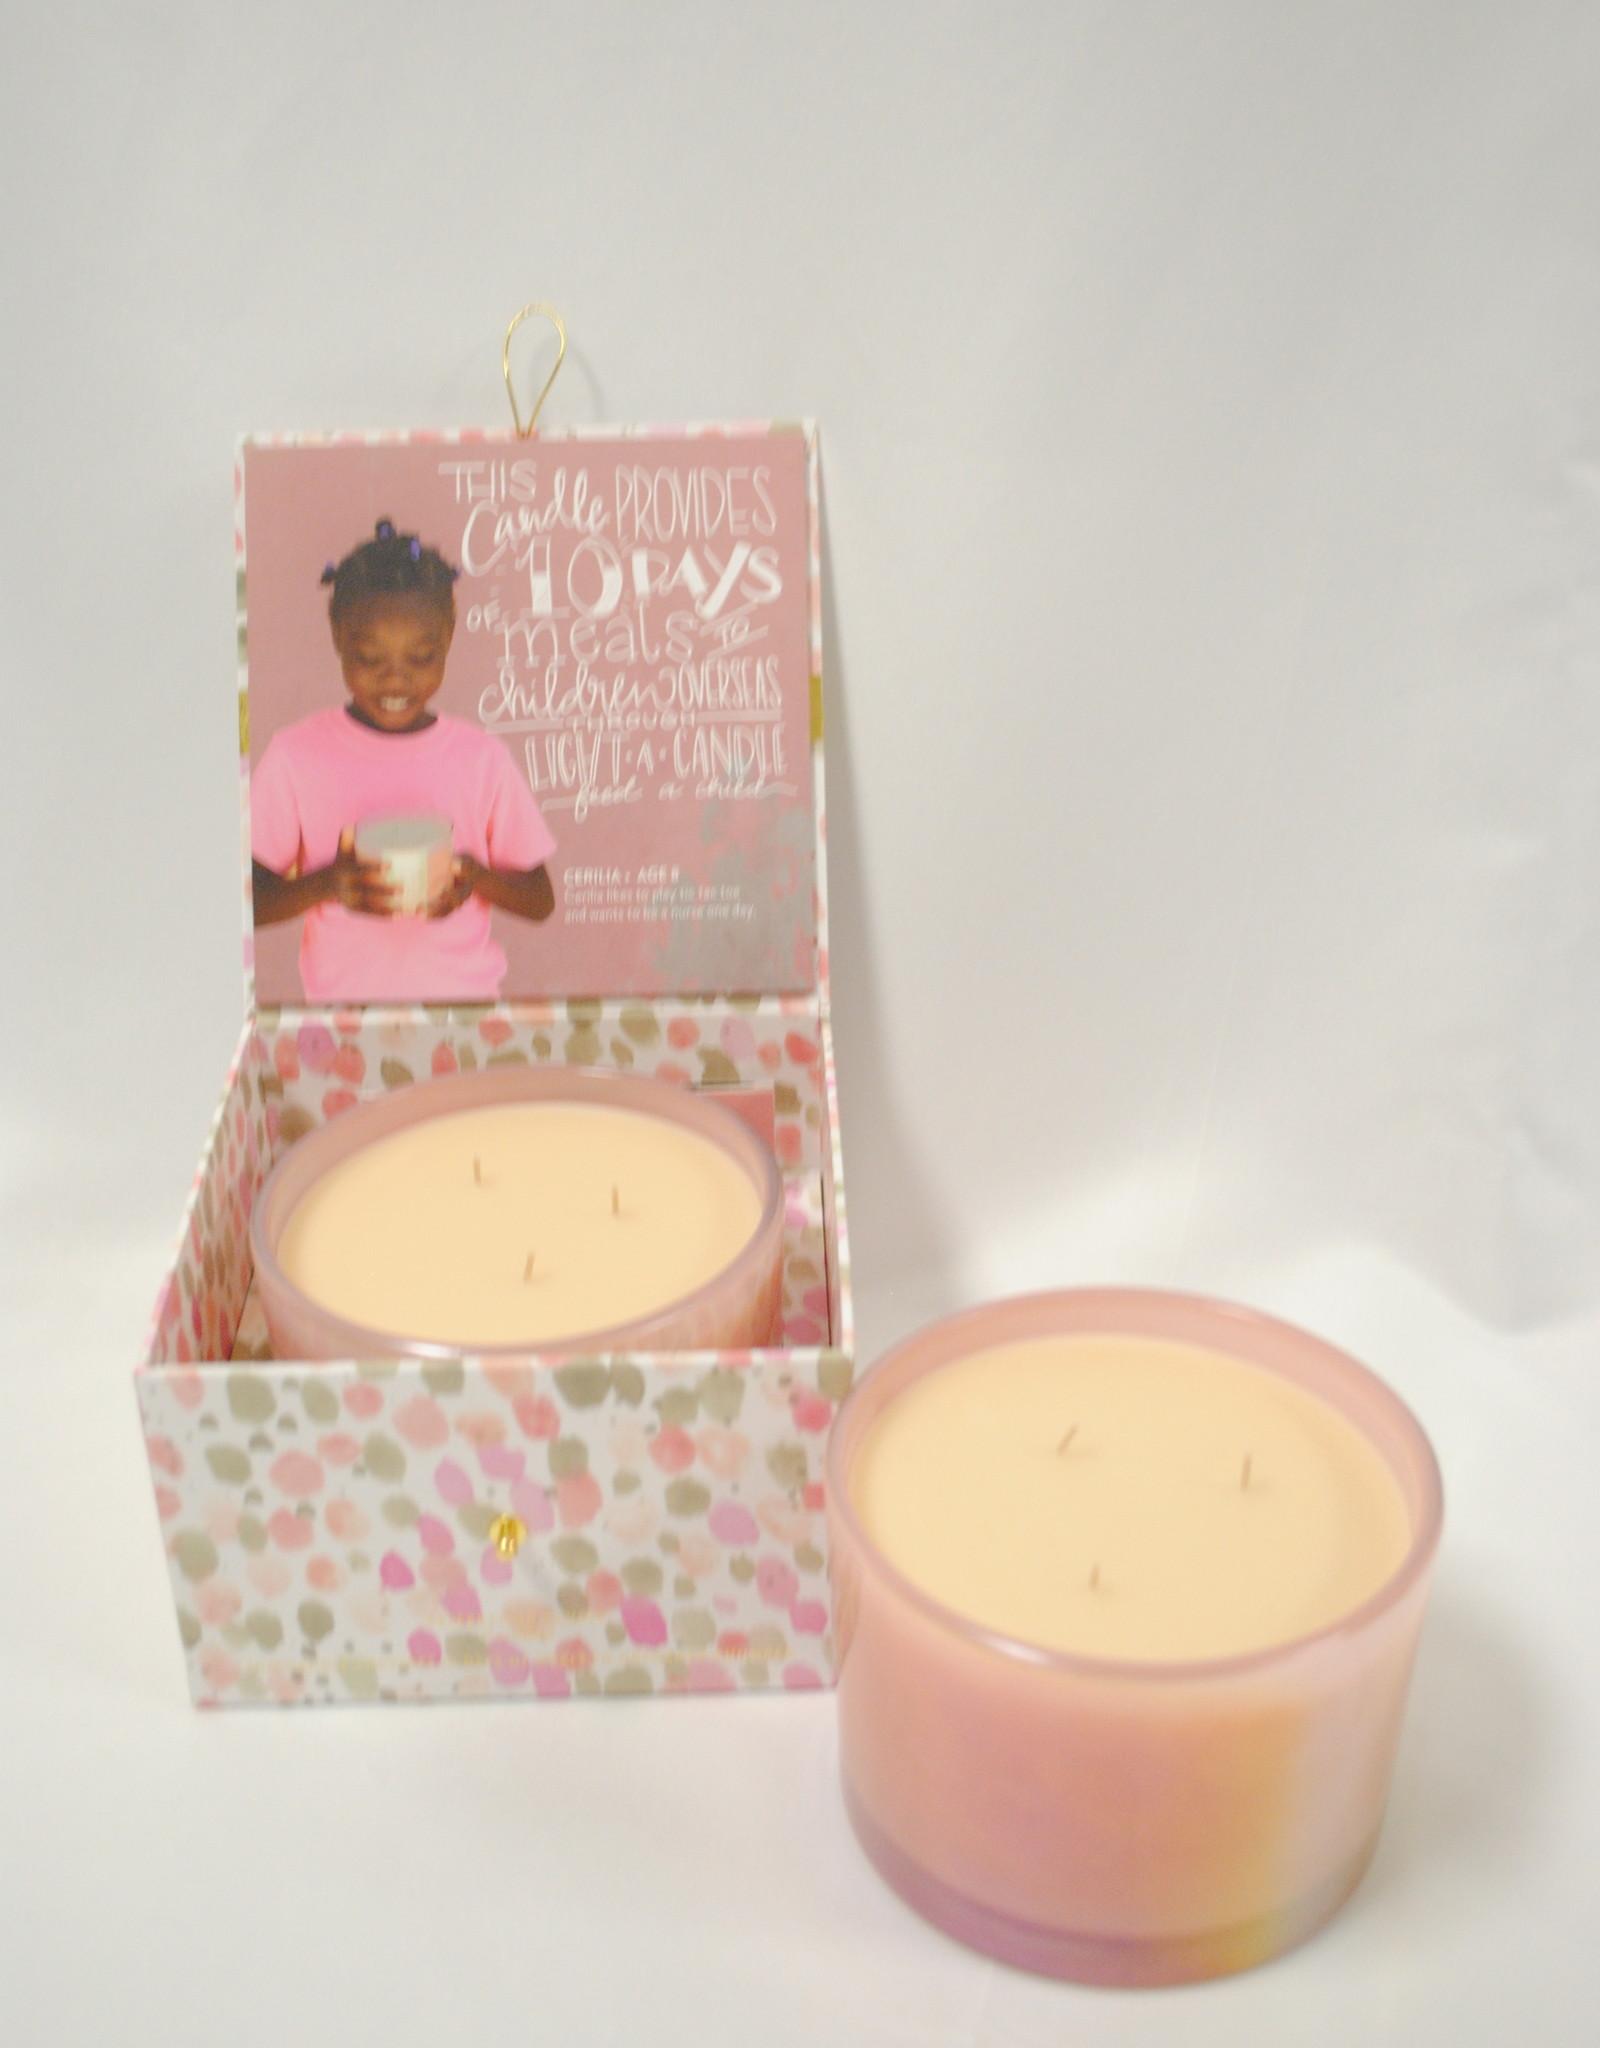 Bridgewater Candles Celebration Collection